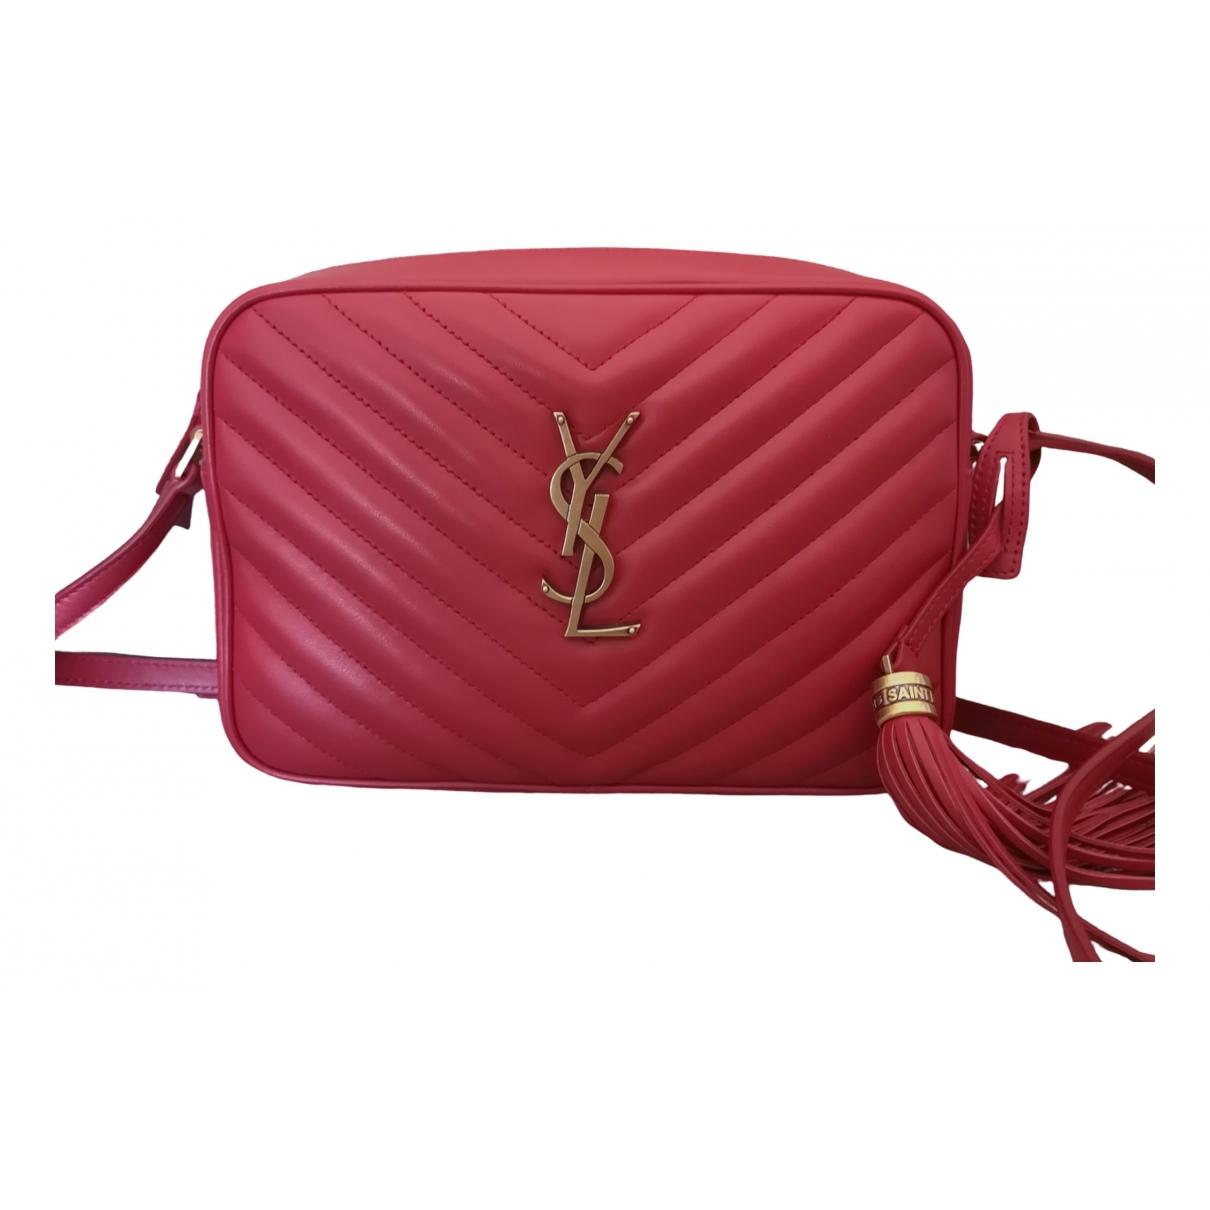 Saint Laurent \N Handtasche in  Rot Leder